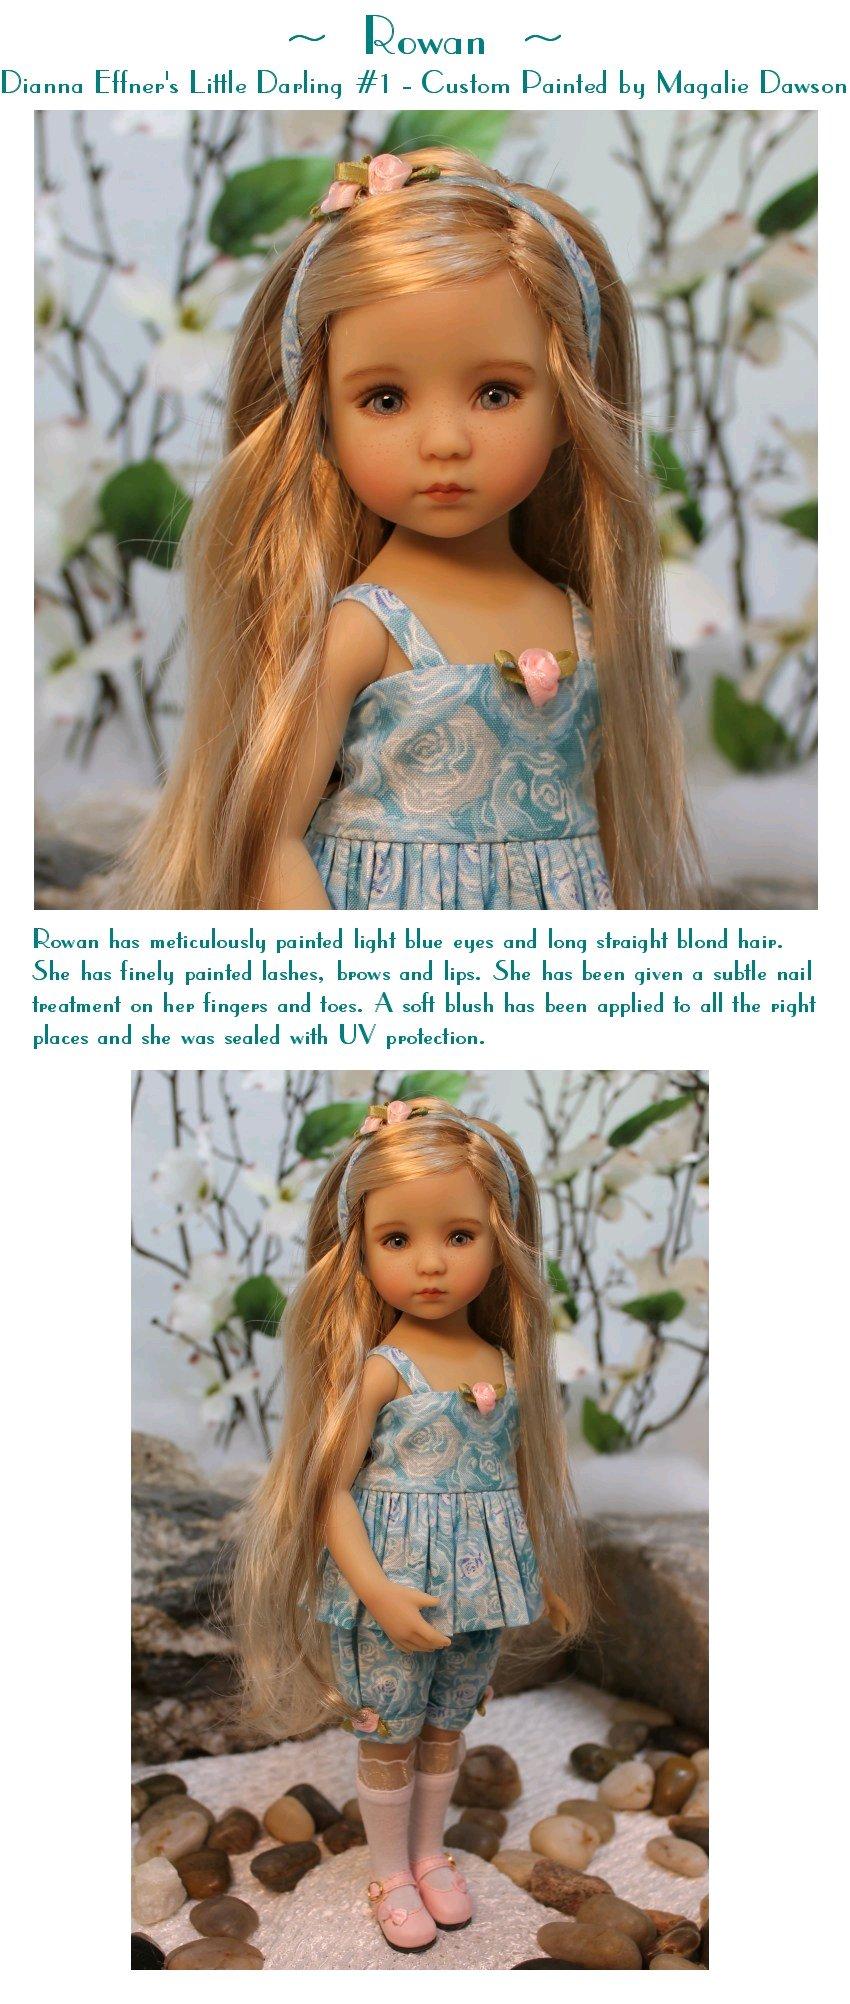 Rowan  - Dianna Effner's Little Darling Painted by Magalie Dawson